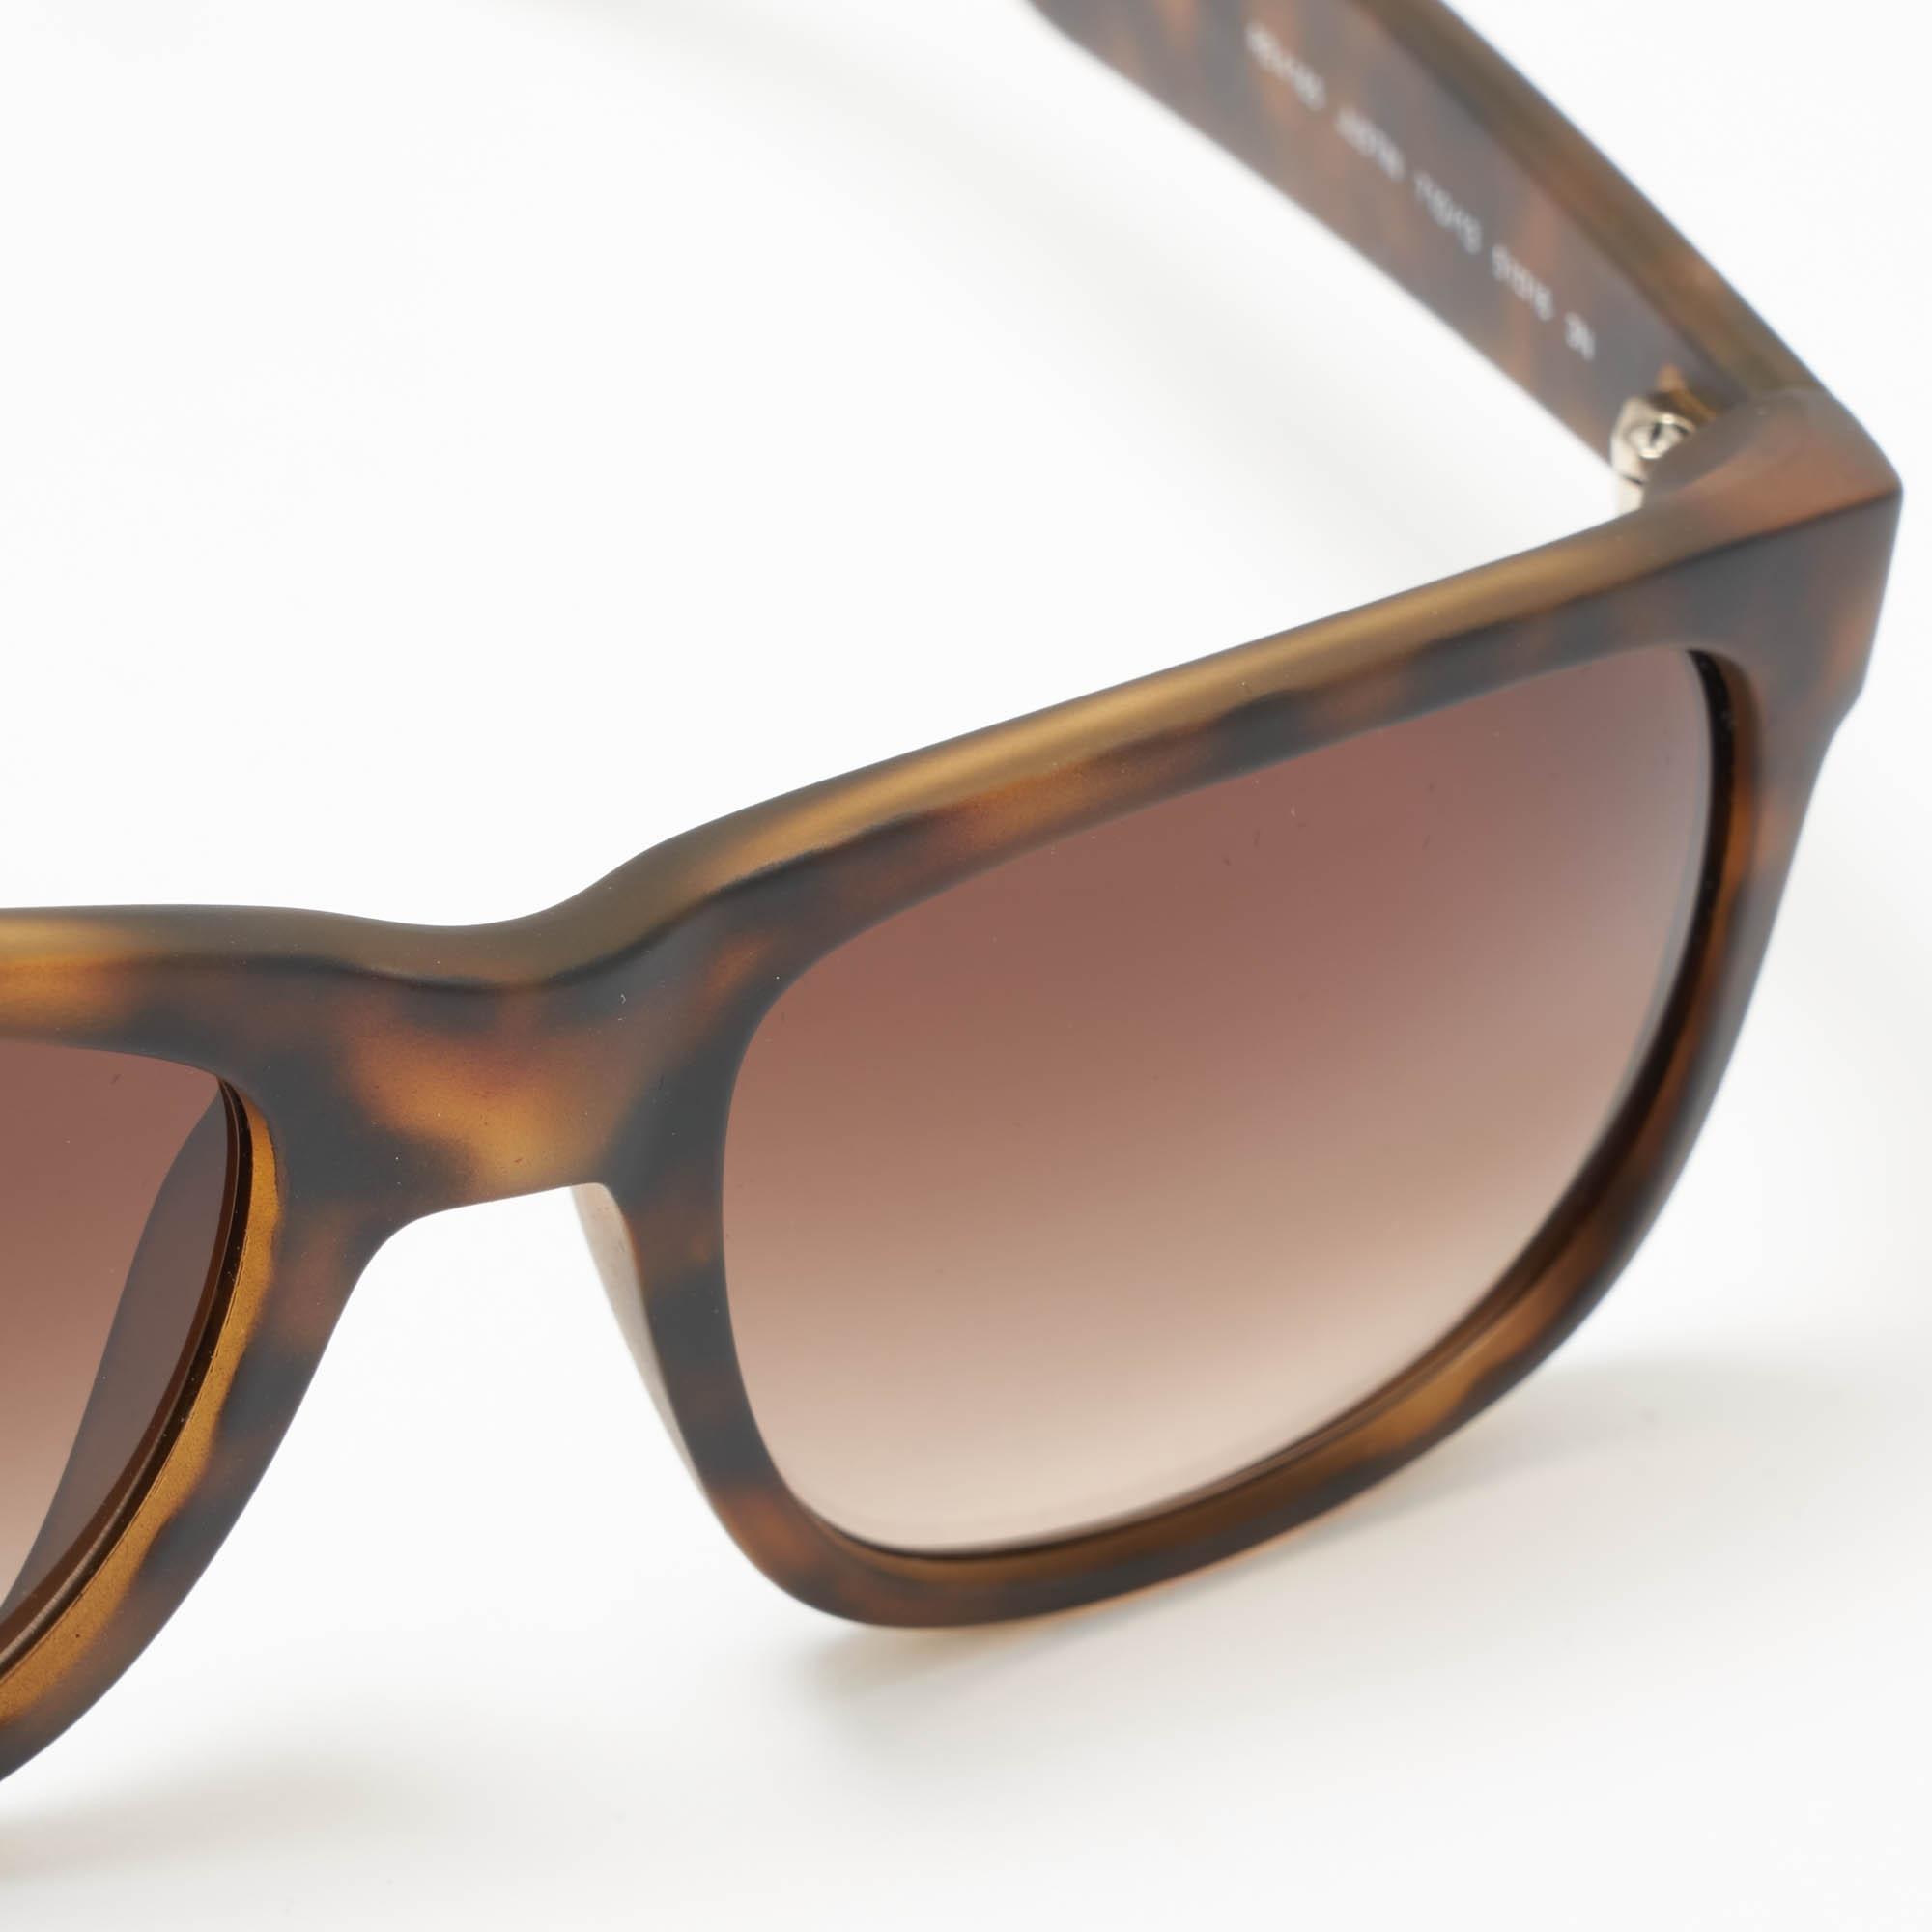 08e1df219a Tortoise Justin Sunglasses - Brown Gradient Lenses